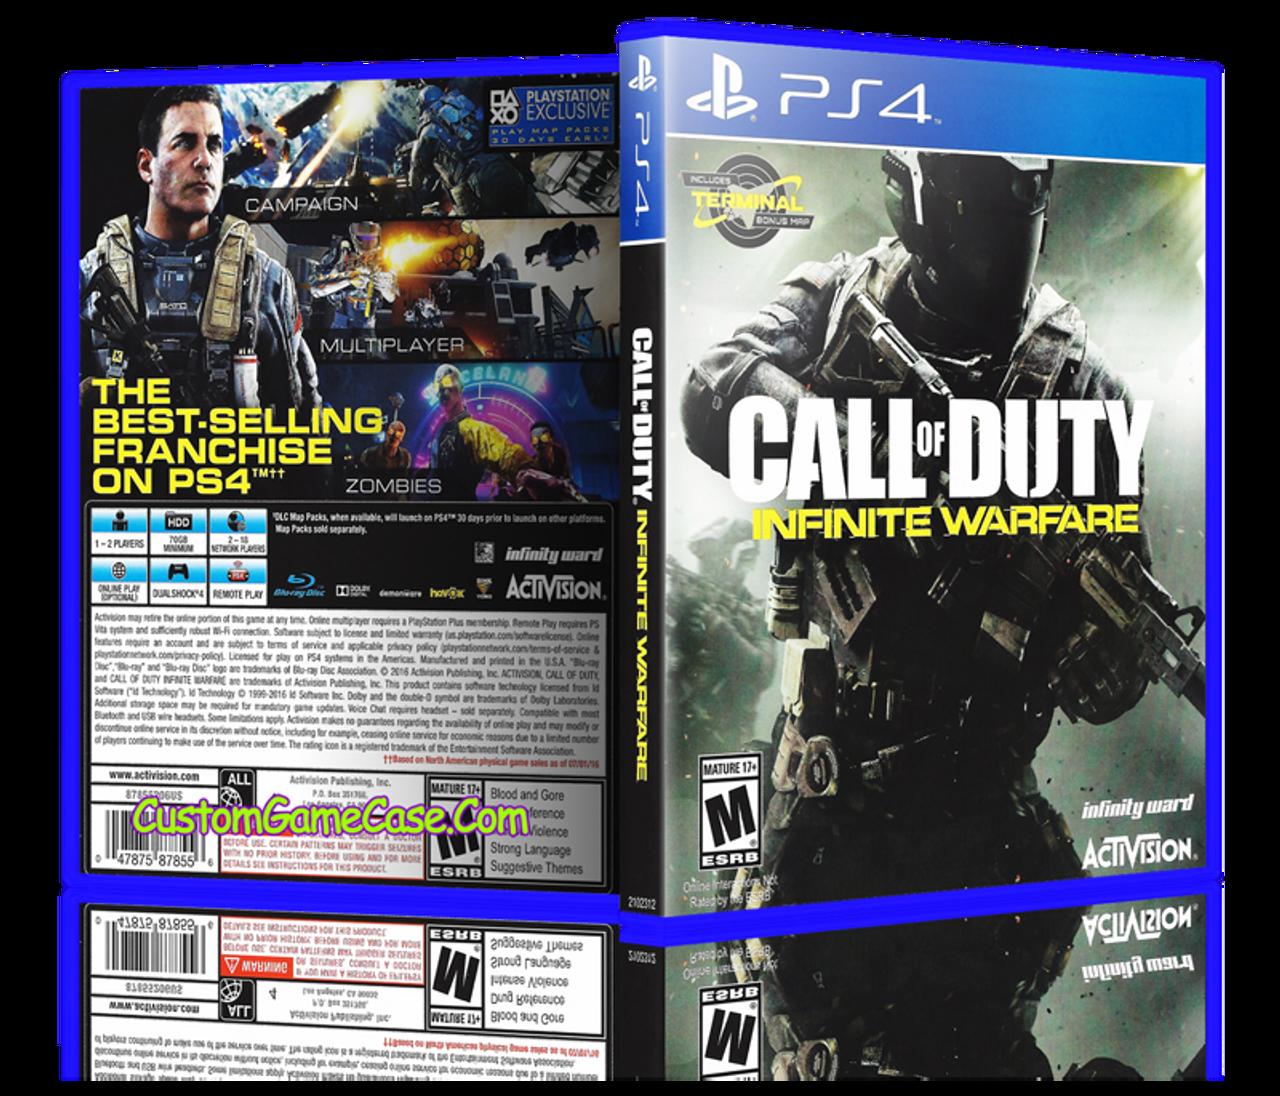 call of duty advanced warfare manual ps4